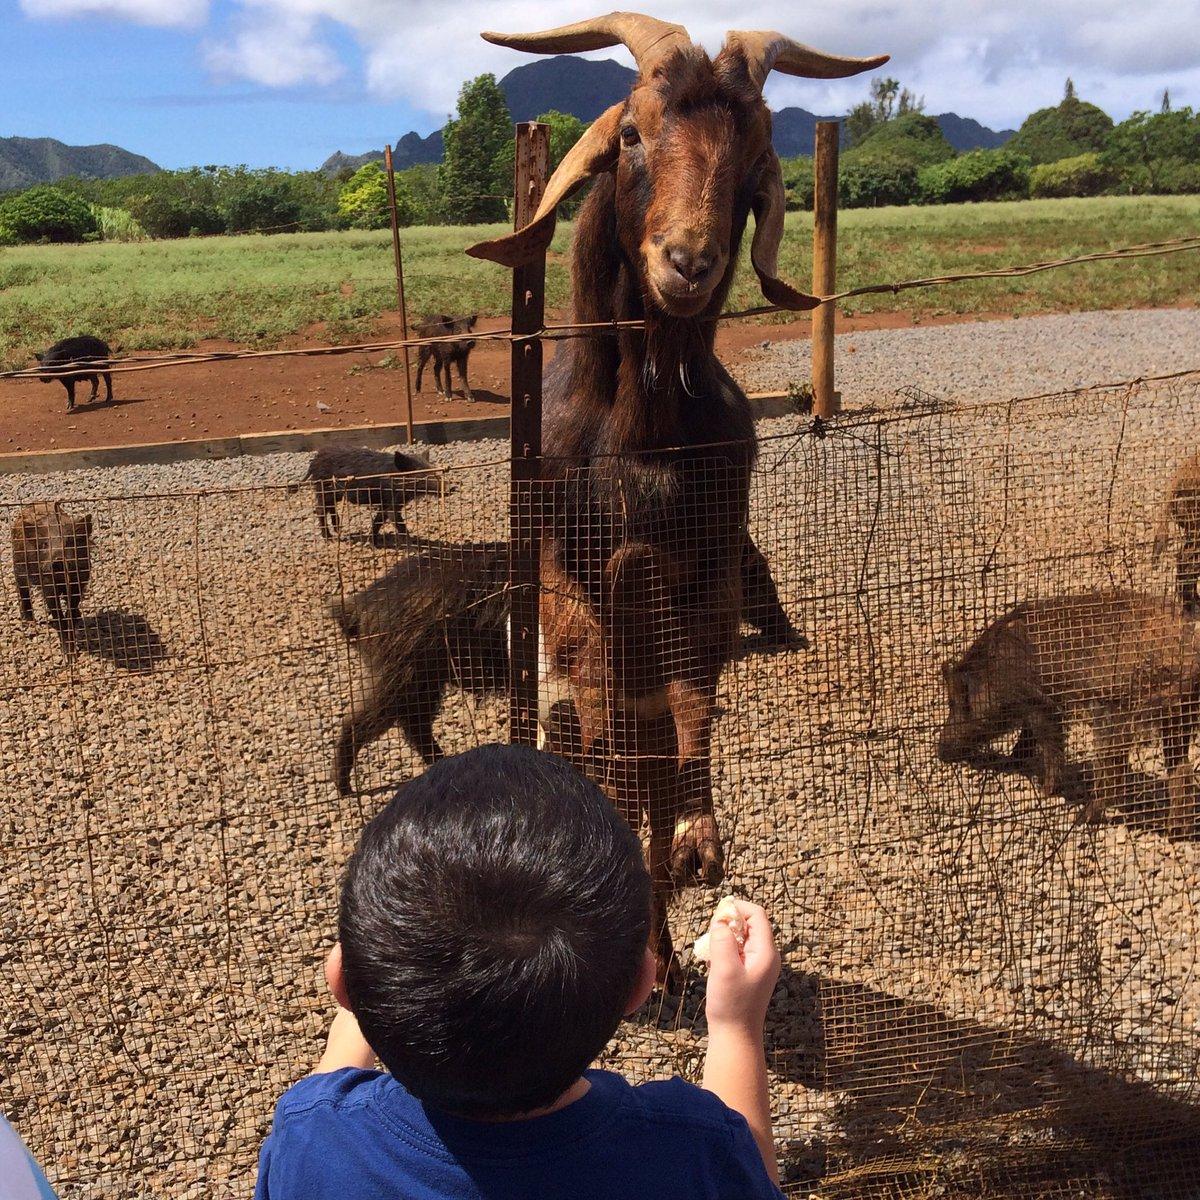 The kiddos had a blast feeding the pigs & goats! https://t.co/RmuwSCknXP #kauai #familytravel https://t.co/lWxl5XnANC